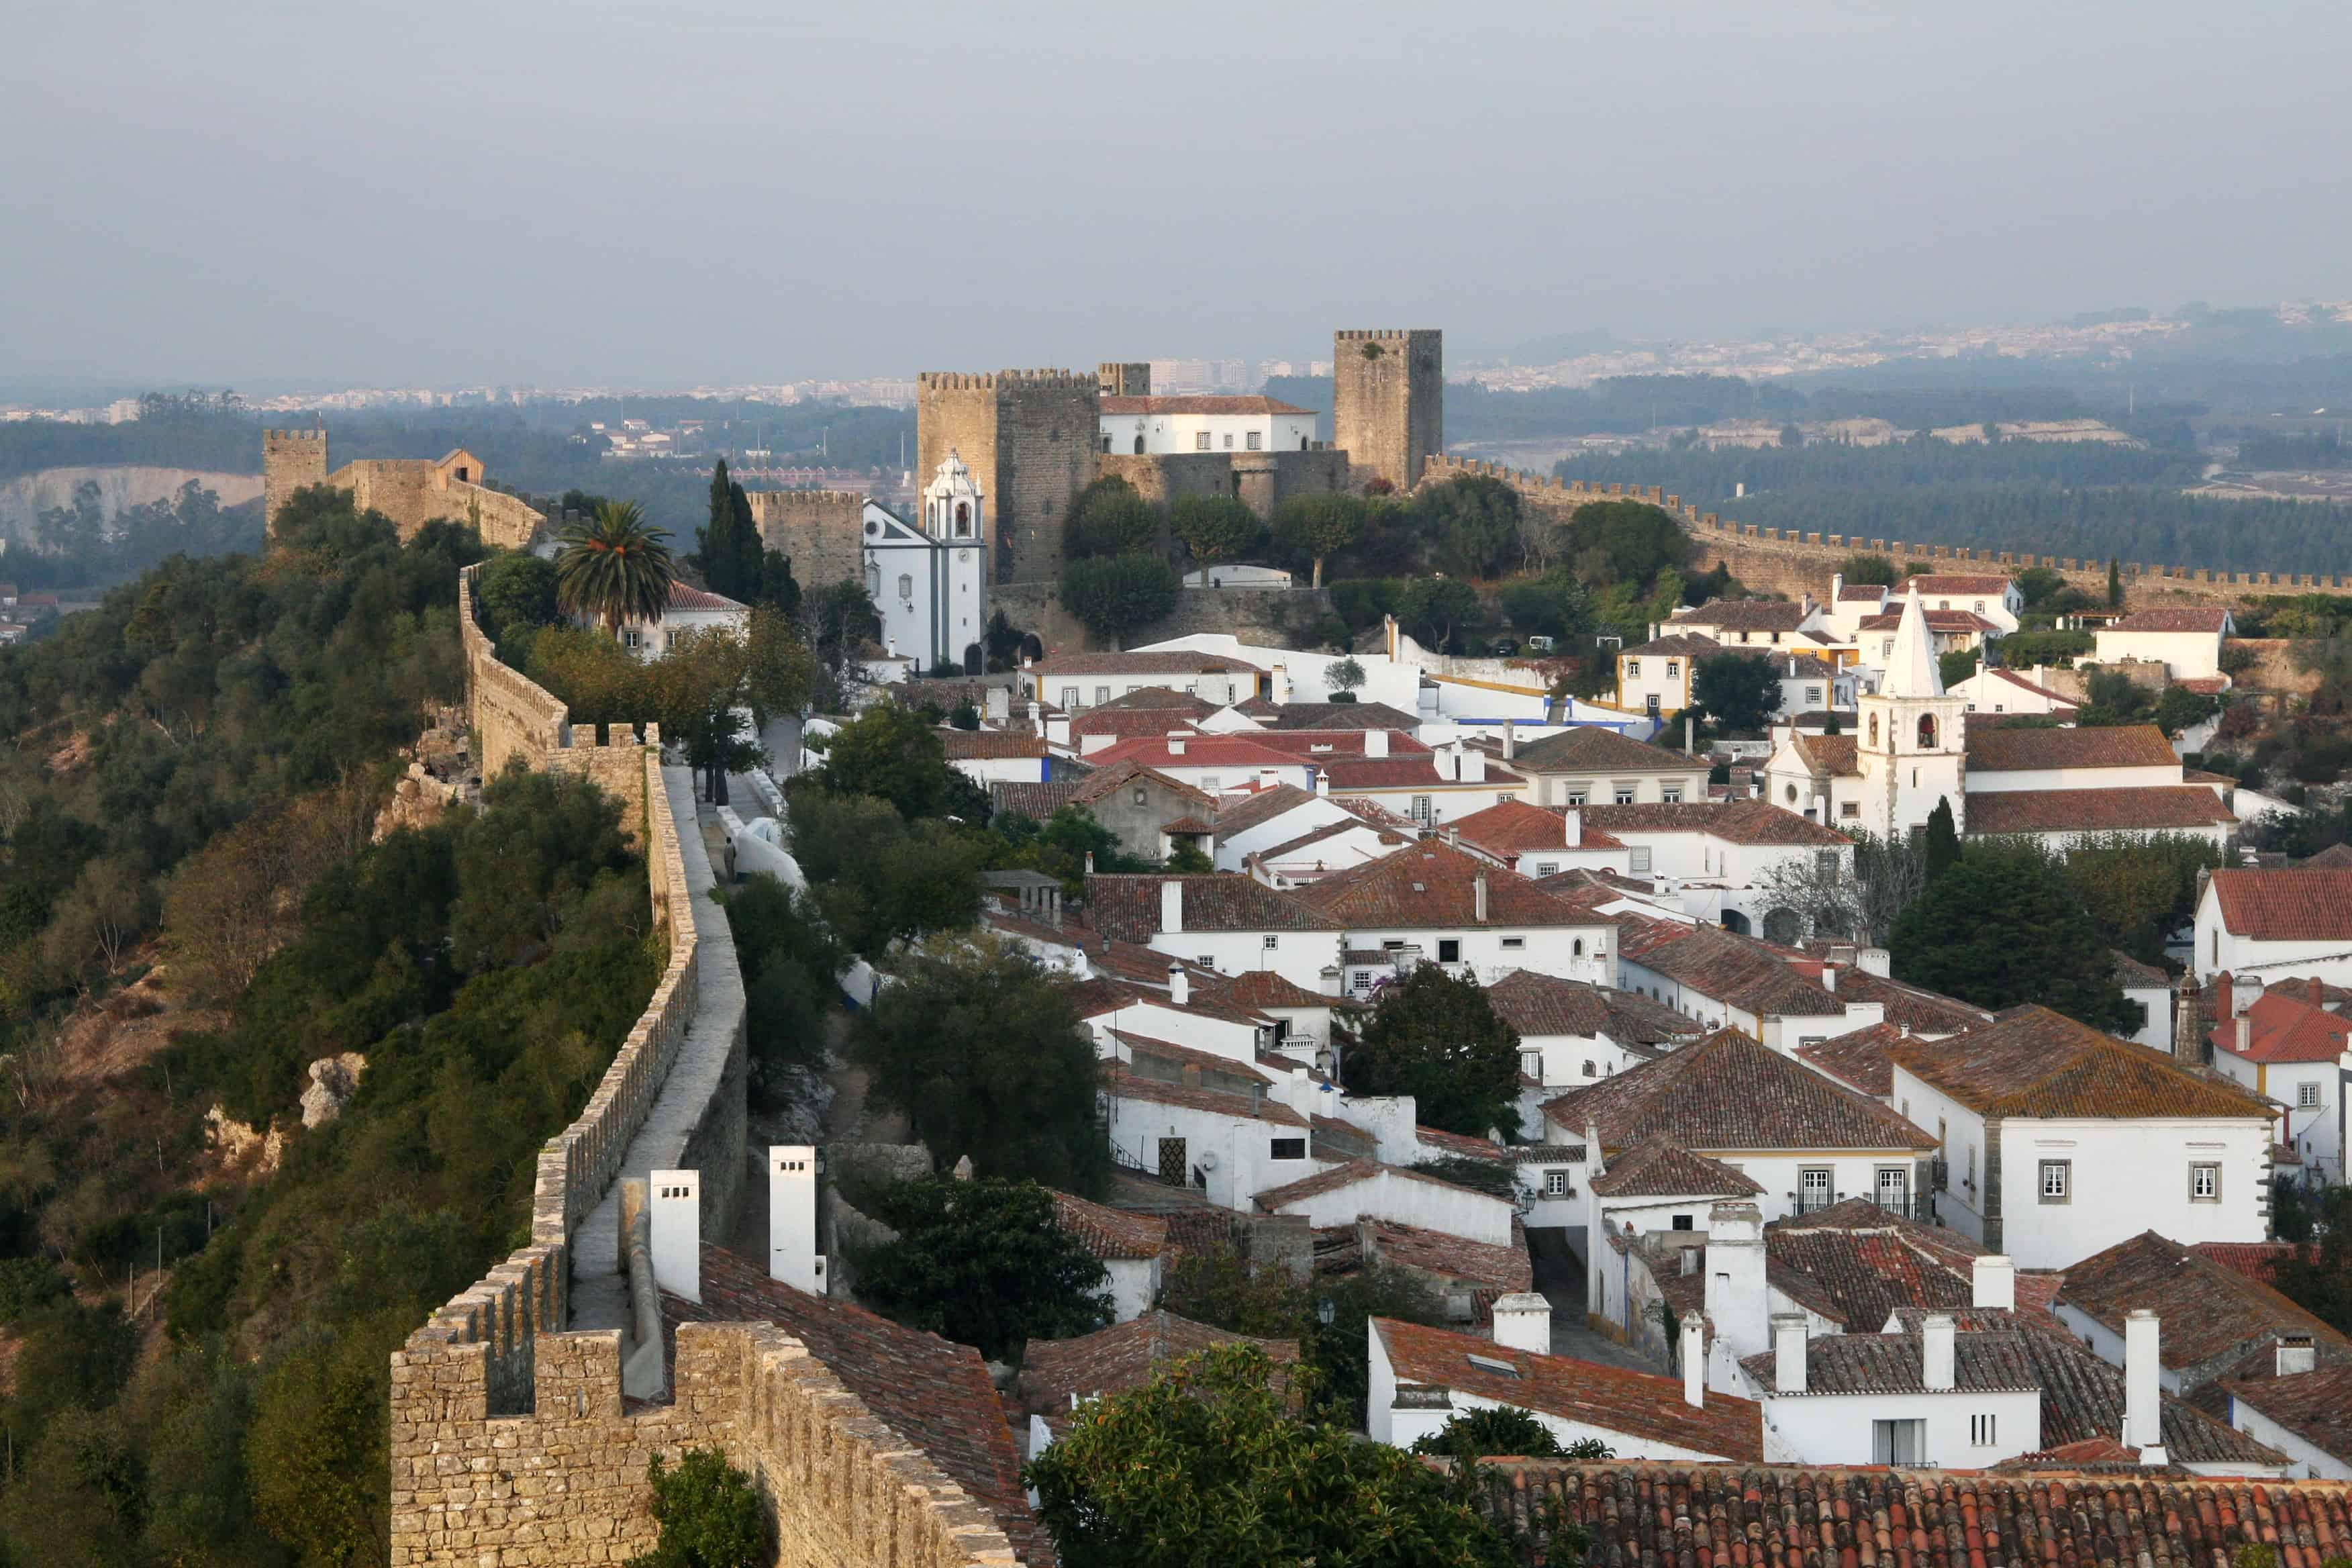 Pousada de Óbidos, Portugal - Best Castle Hotels in Europe